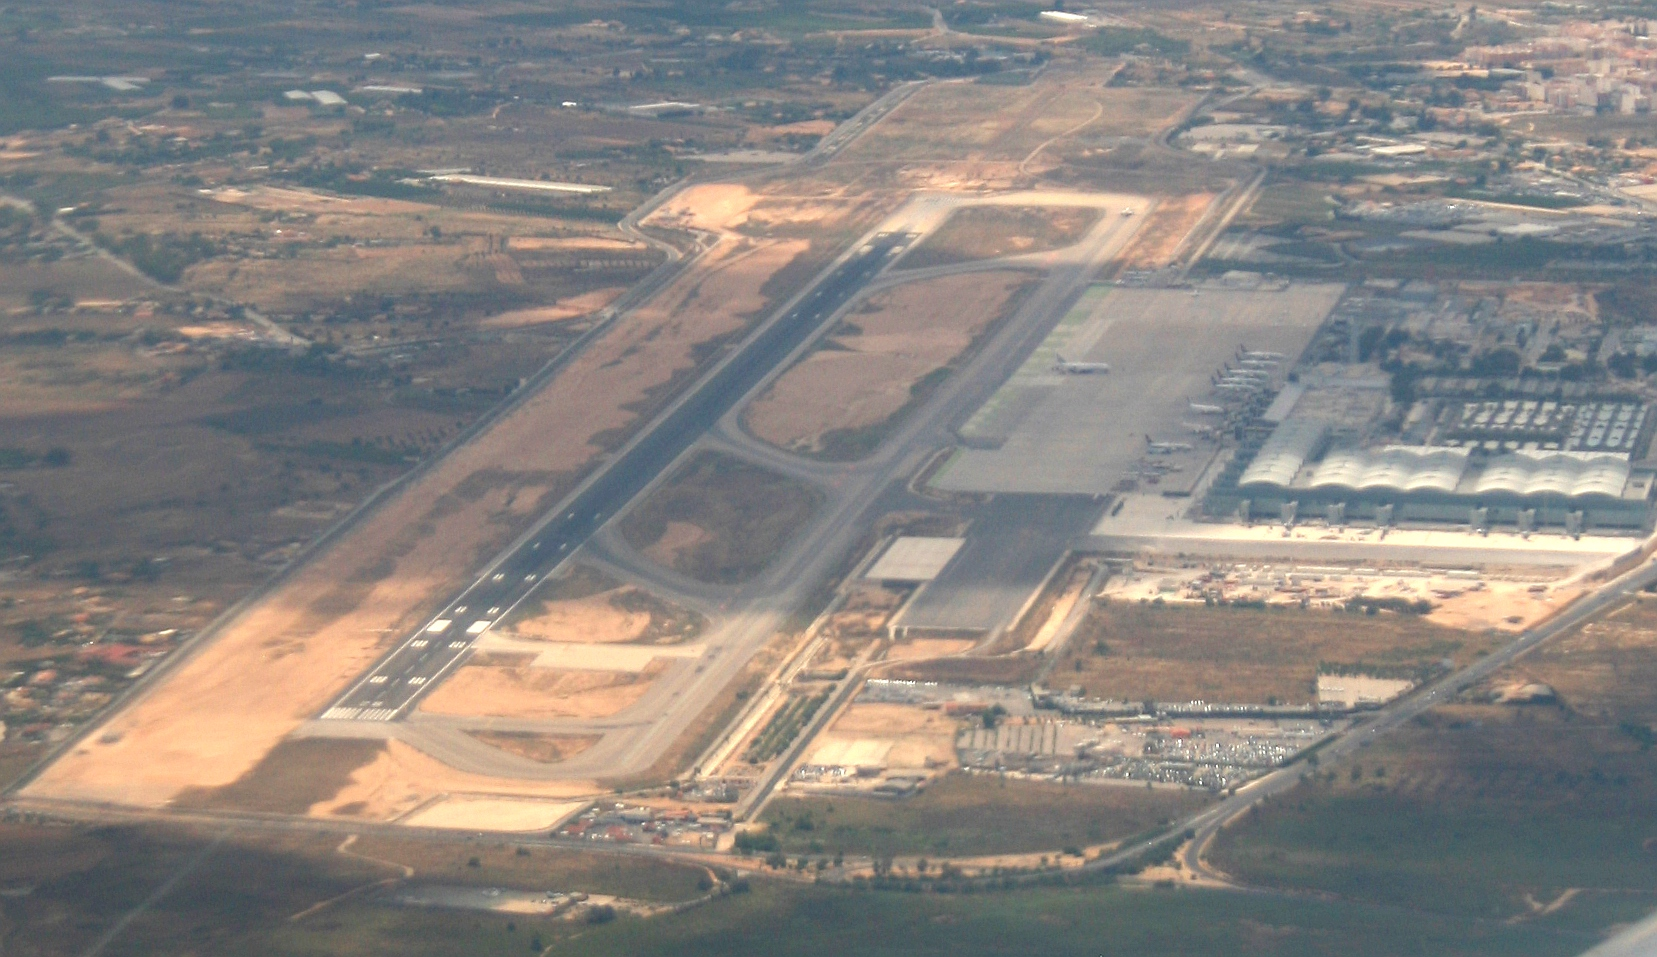 Aeroporto de Alacant-Elx